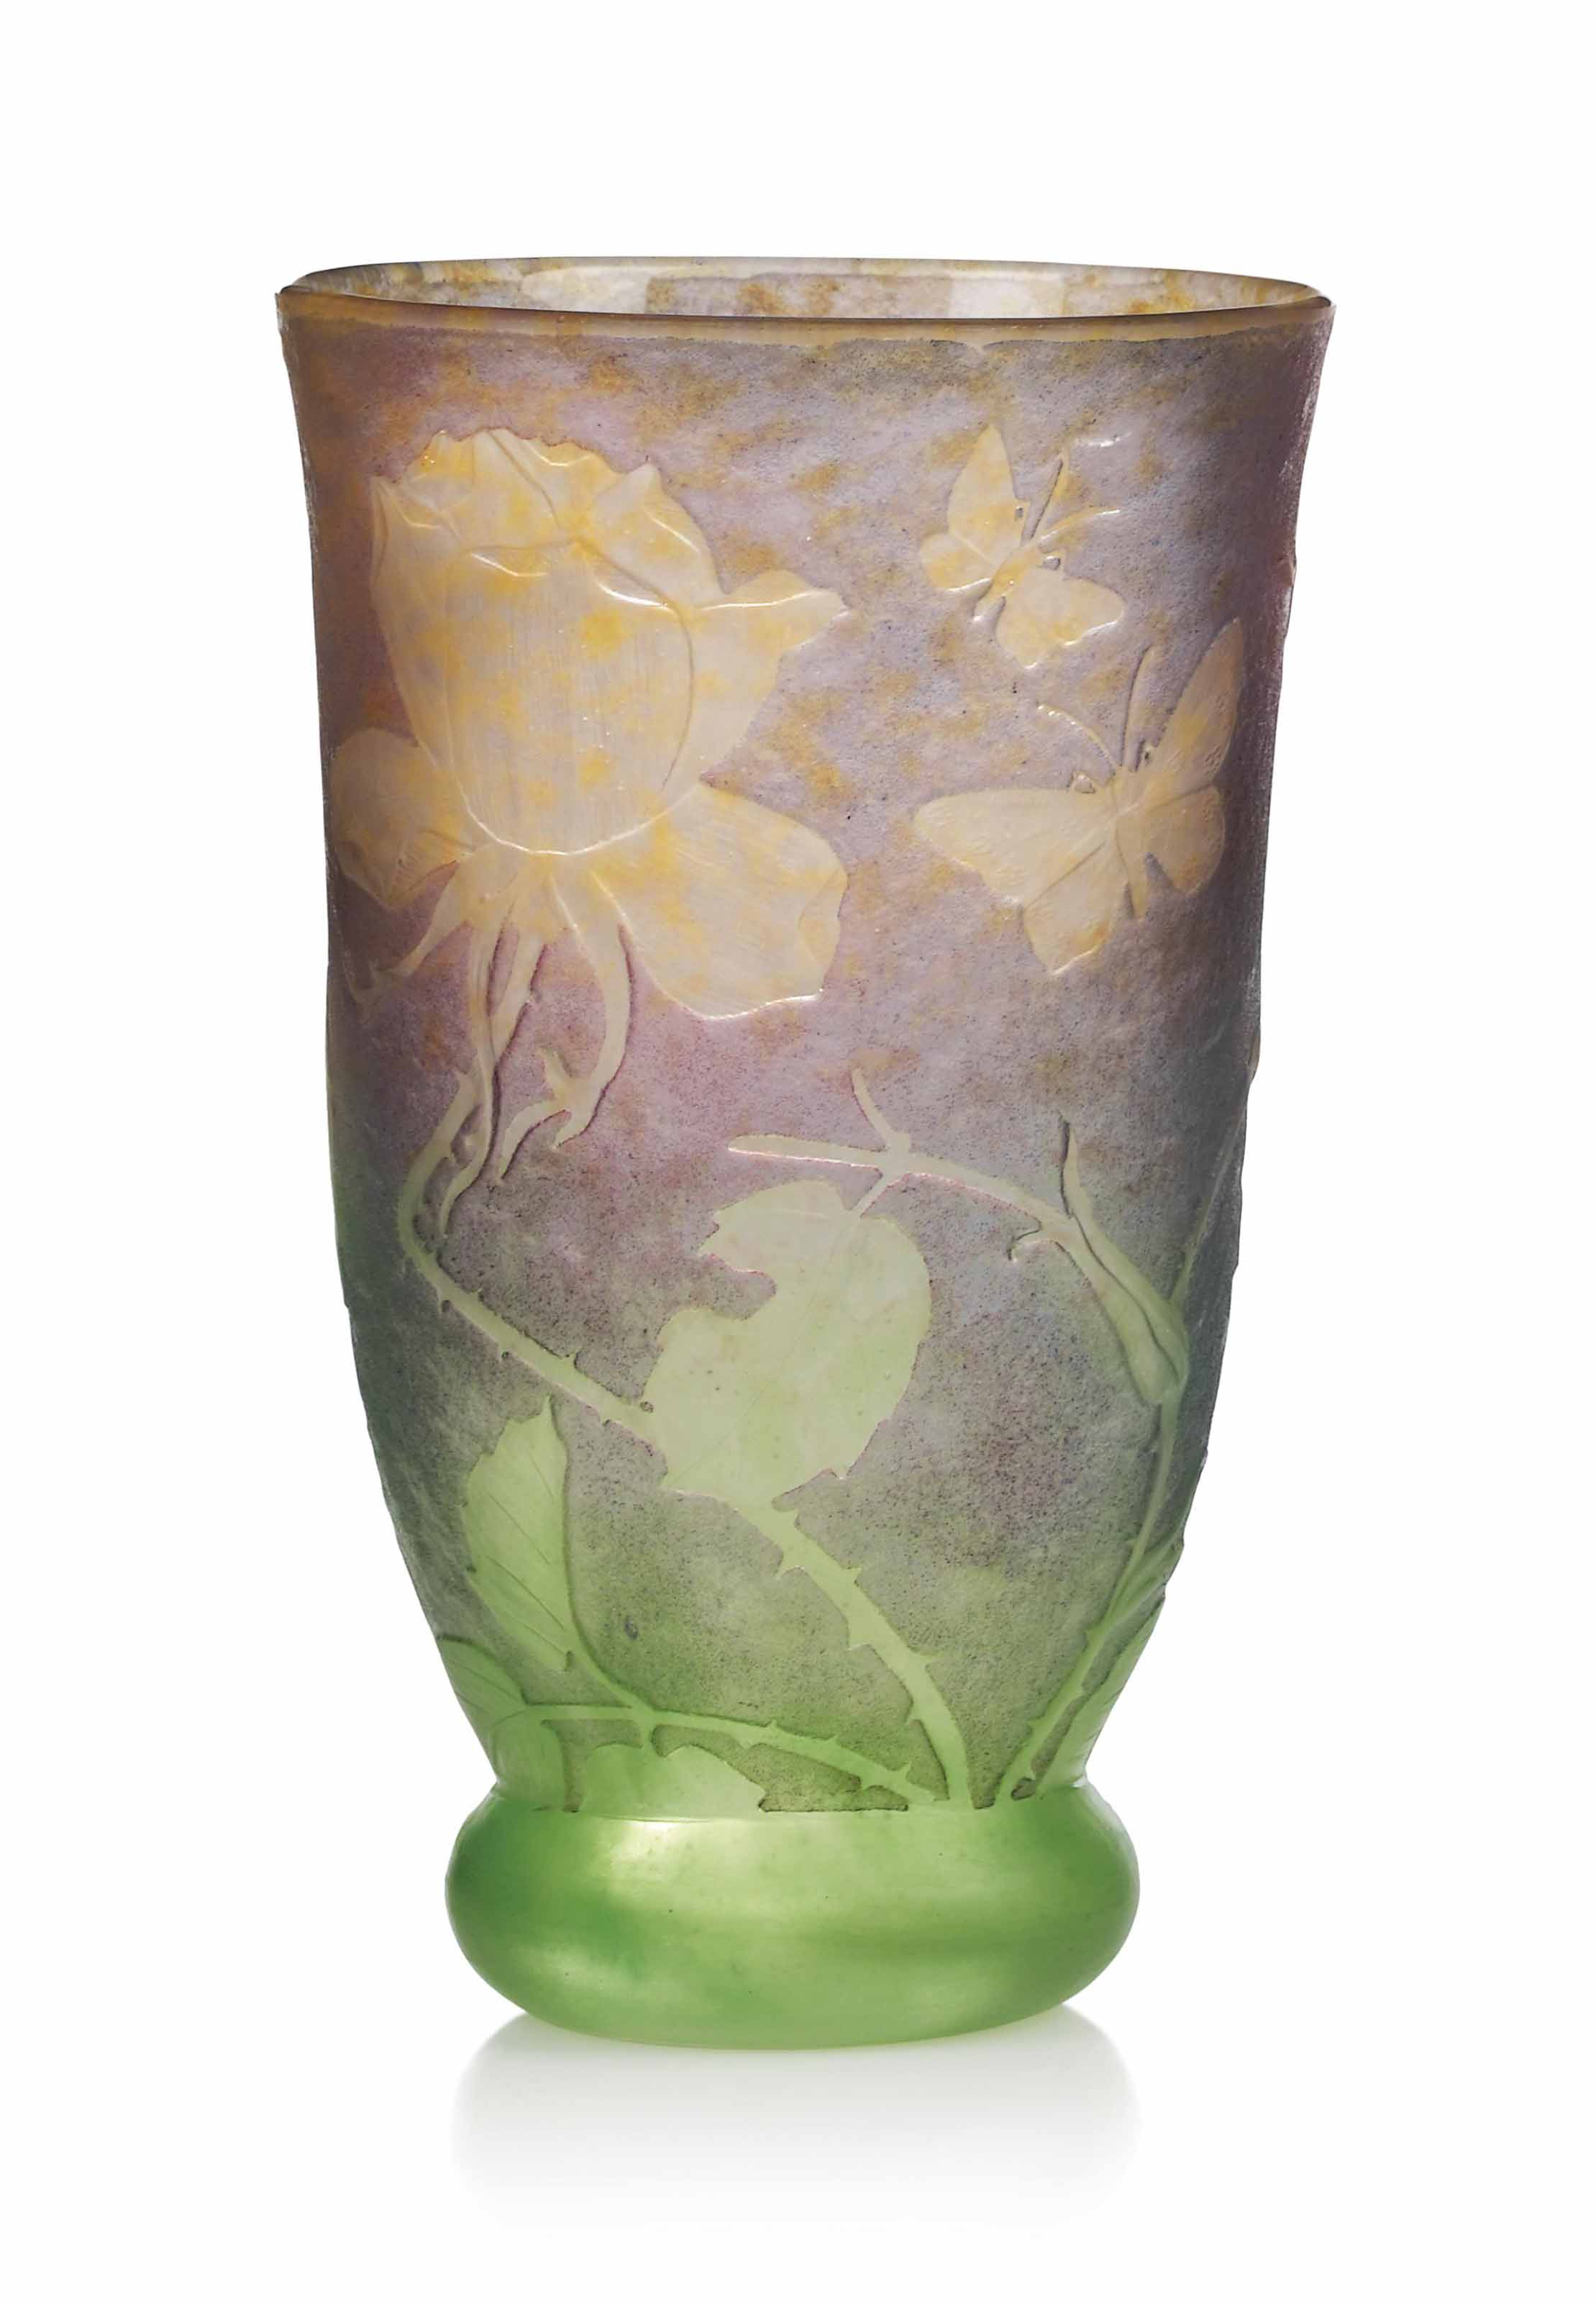 A DAUM WHEEL-CARVED GLASS VASE